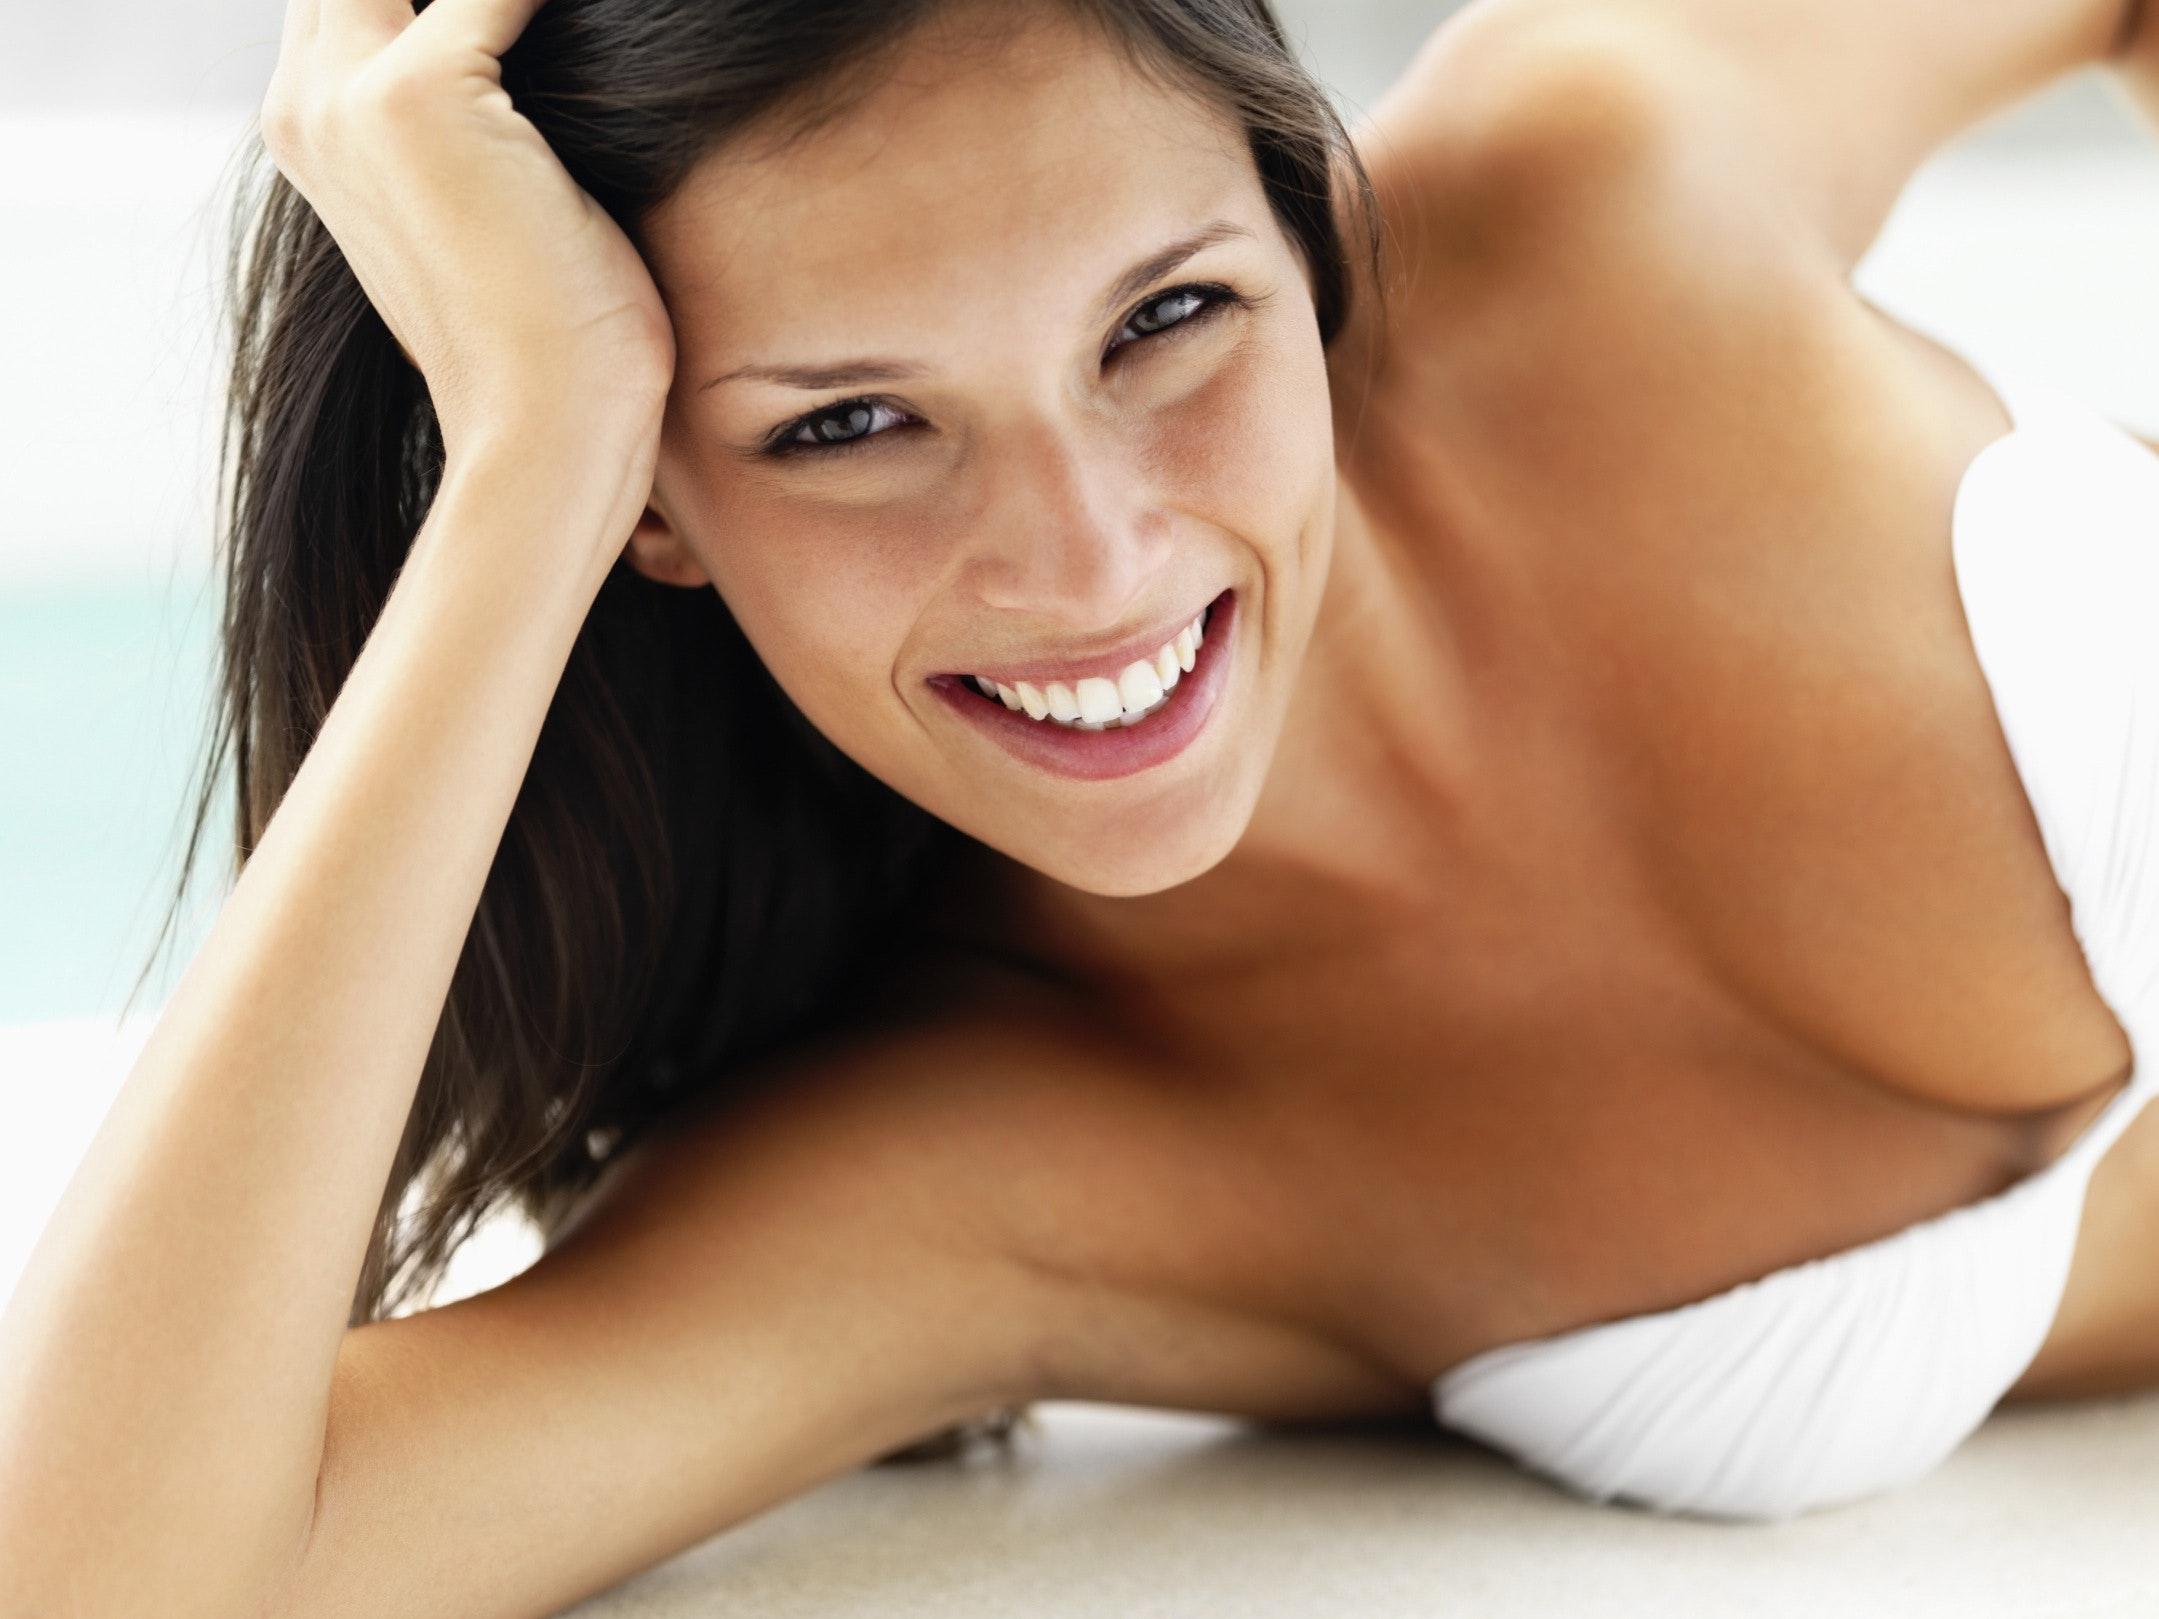 hvordan man får større bryster massage liste